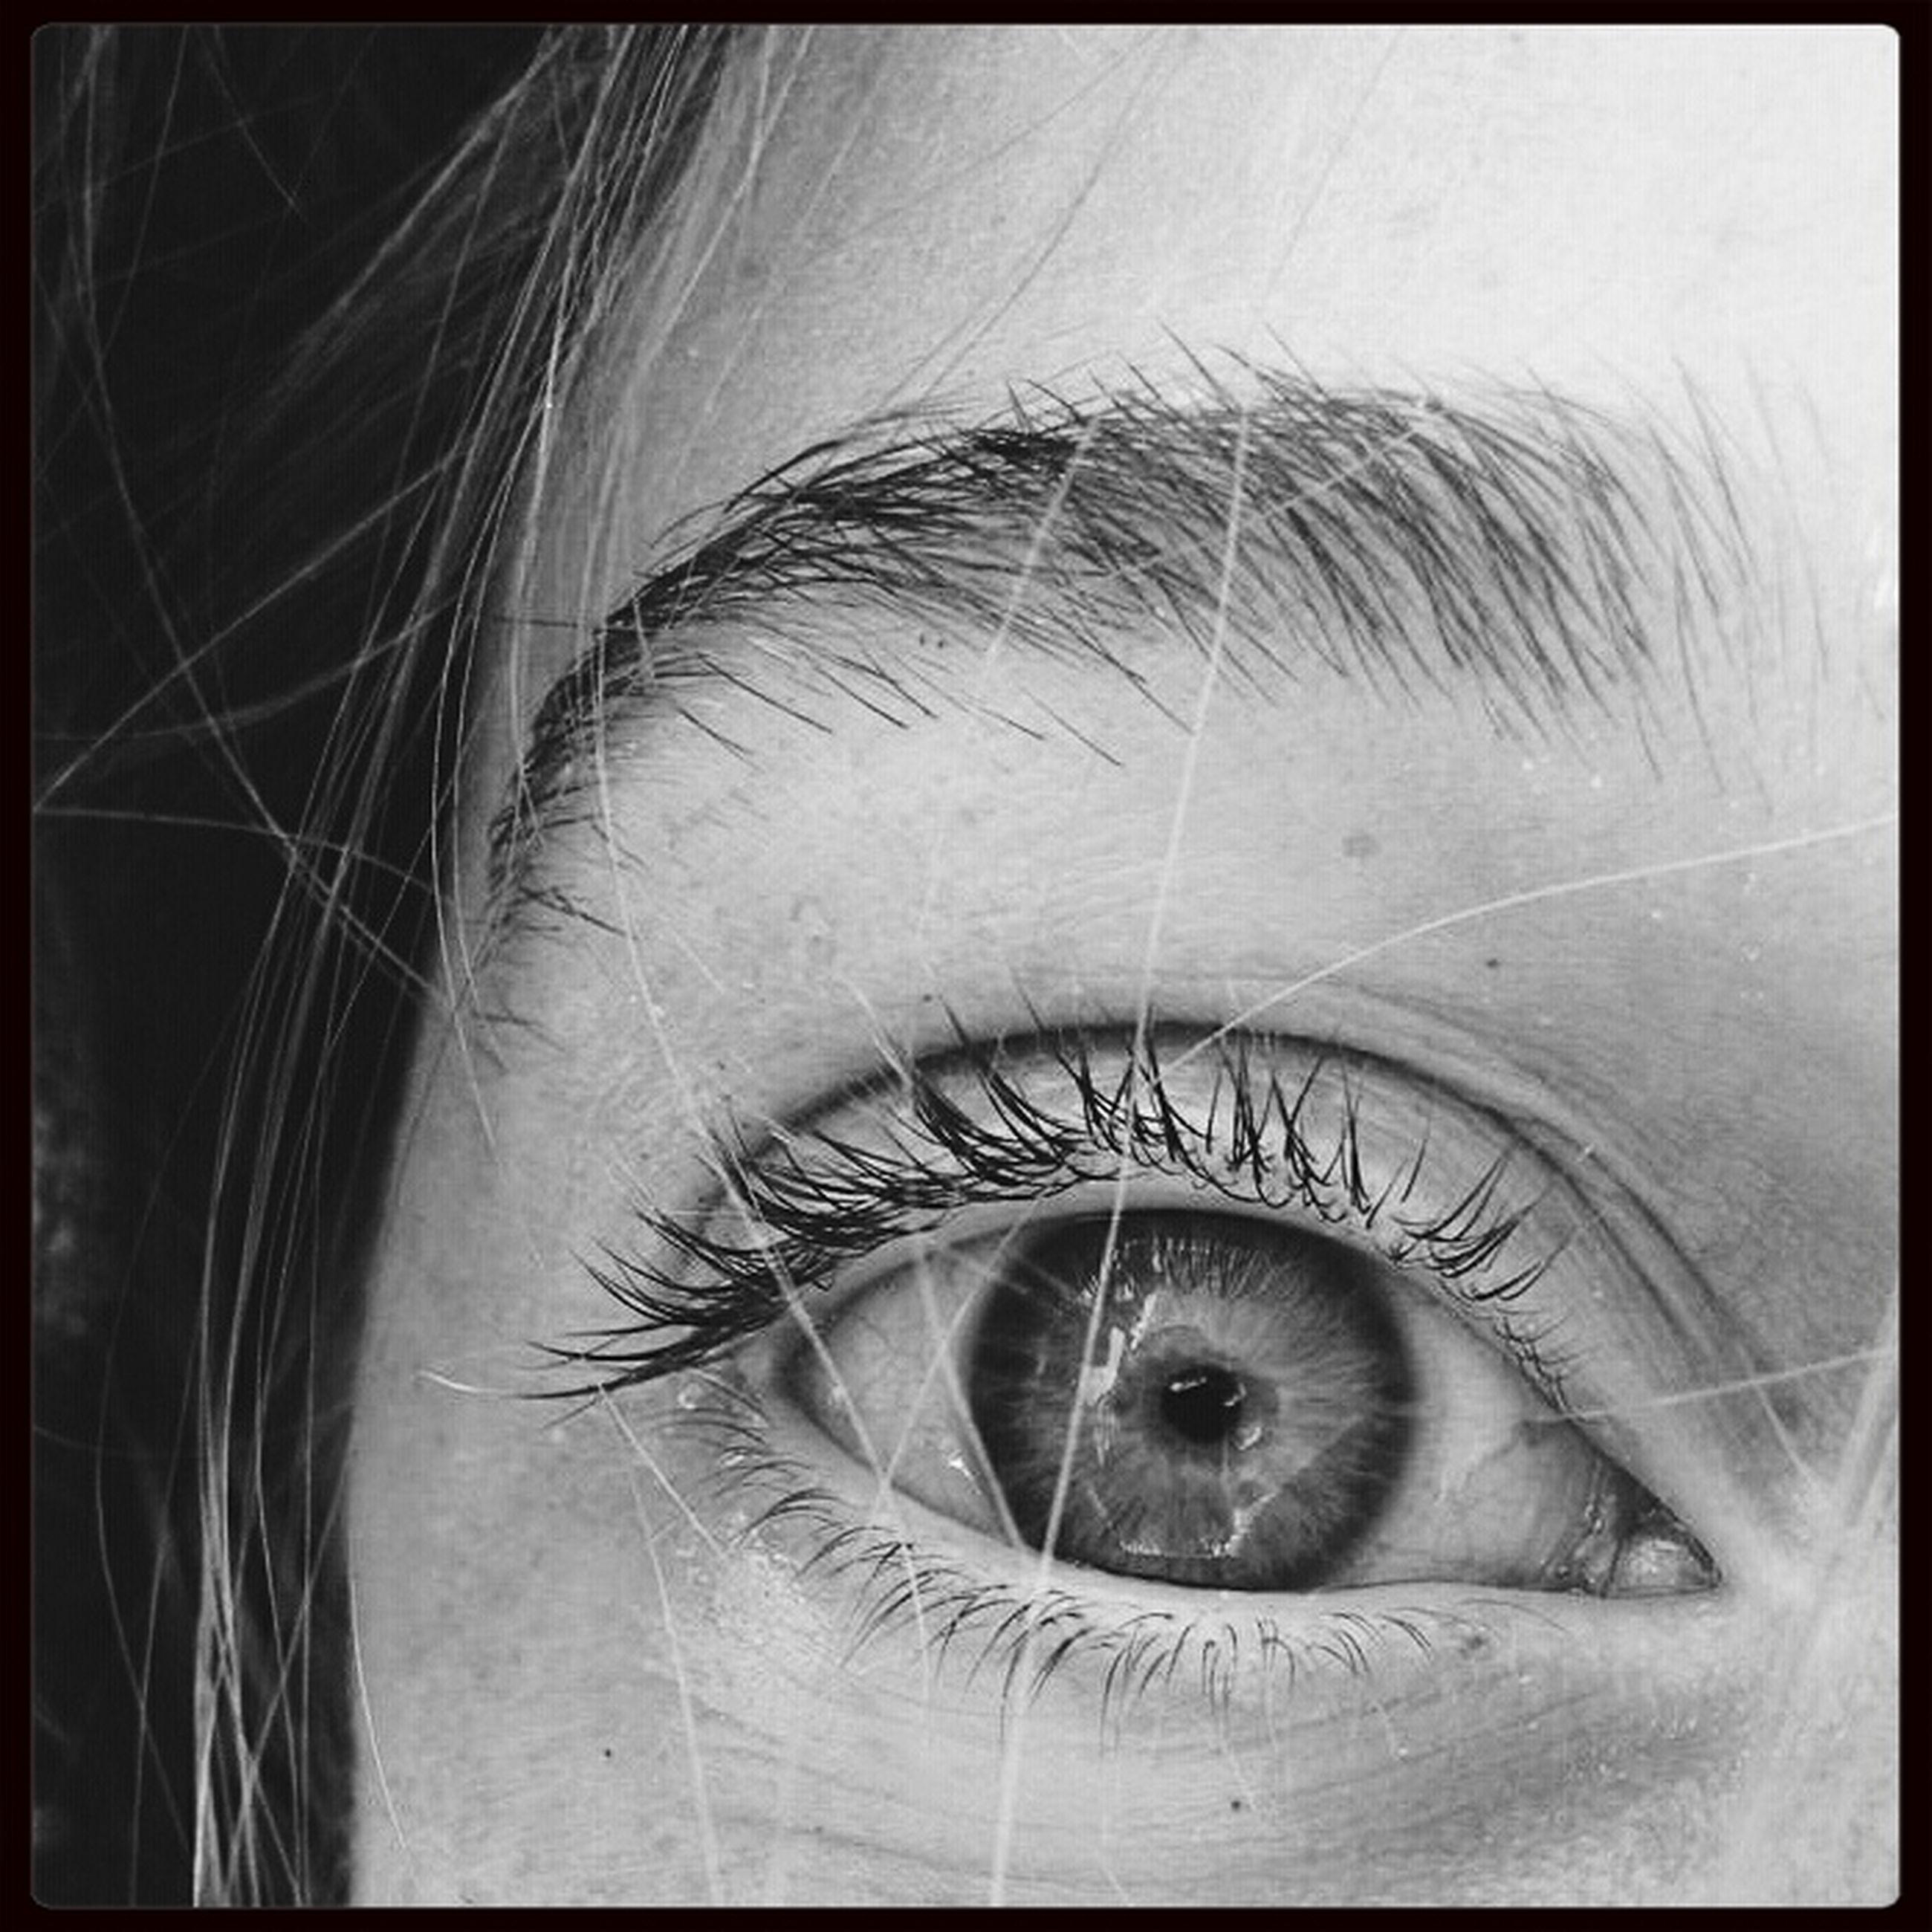 human eye, close-up, eyelash, indoors, eyesight, sensory perception, part of, auto post production filter, looking at camera, human skin, human face, transfer print, extreme close-up, lifestyles, portrait, eyeball, iris - eye